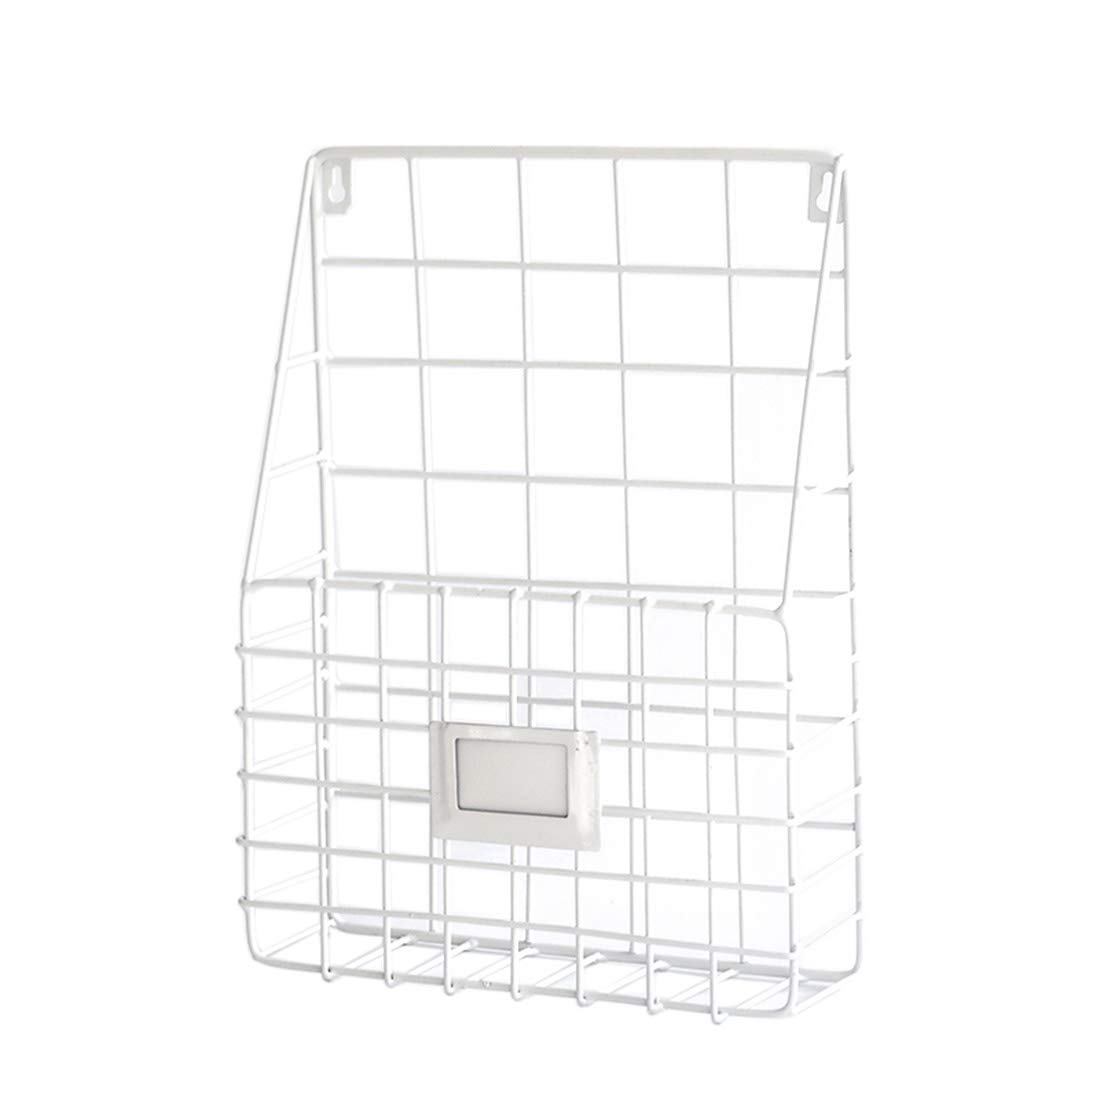 YUENA Care Mail Basket Metal Wall File Organizer Wall Mounted Magazine Rack Mesh Wire Shelf Black YUEBA CARE